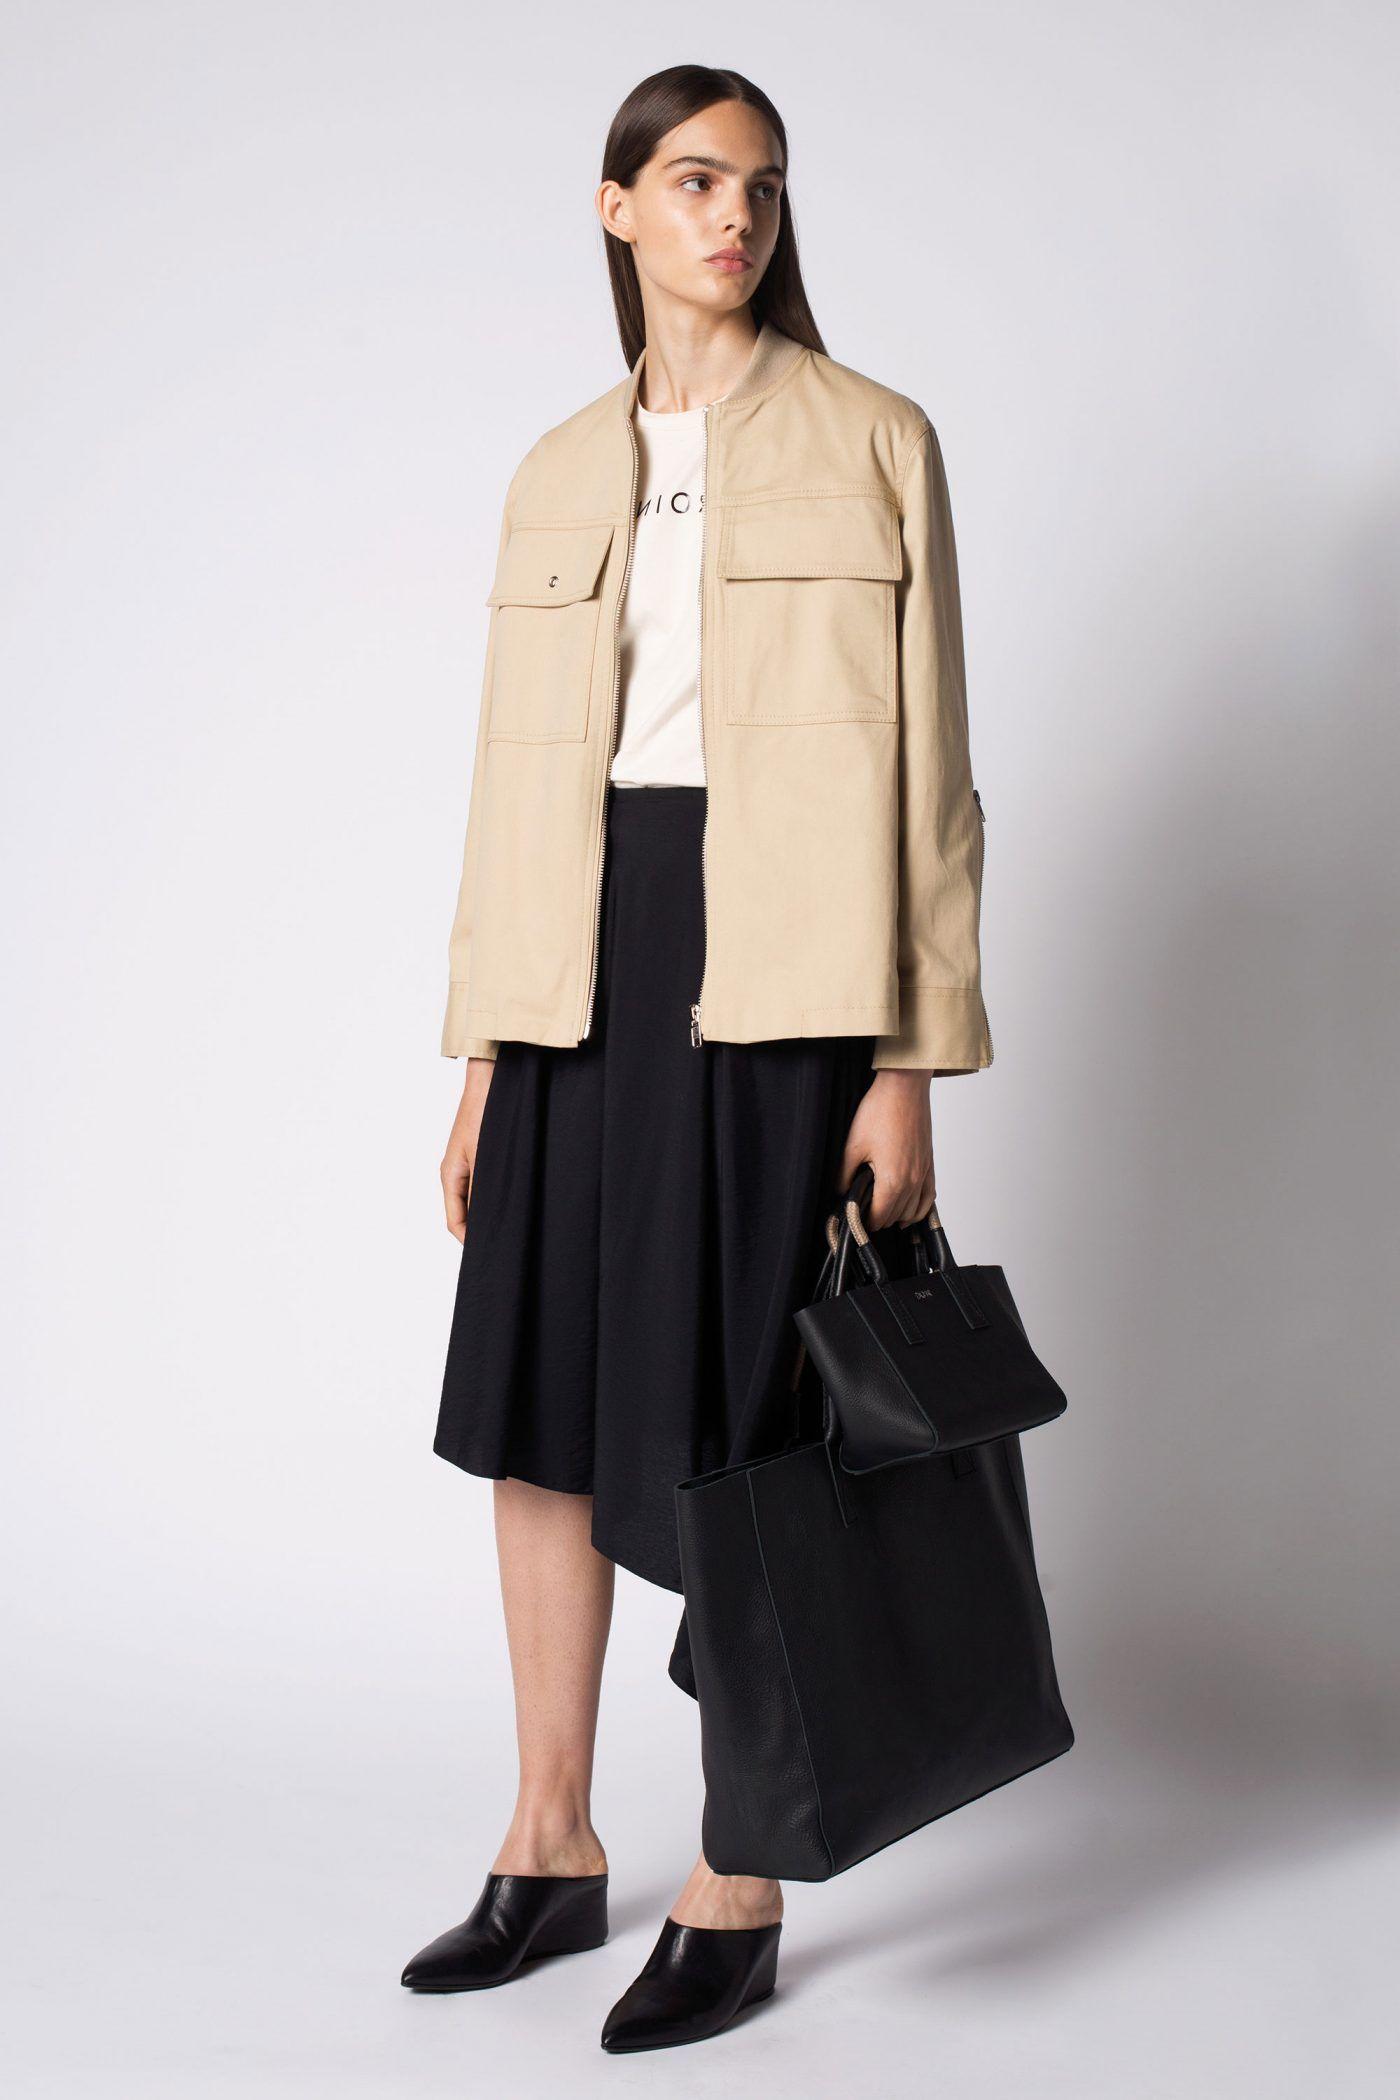 e05c8324d0 Petrina Jacket – House of Dagmar | My Style | Jackets, Swedish ...